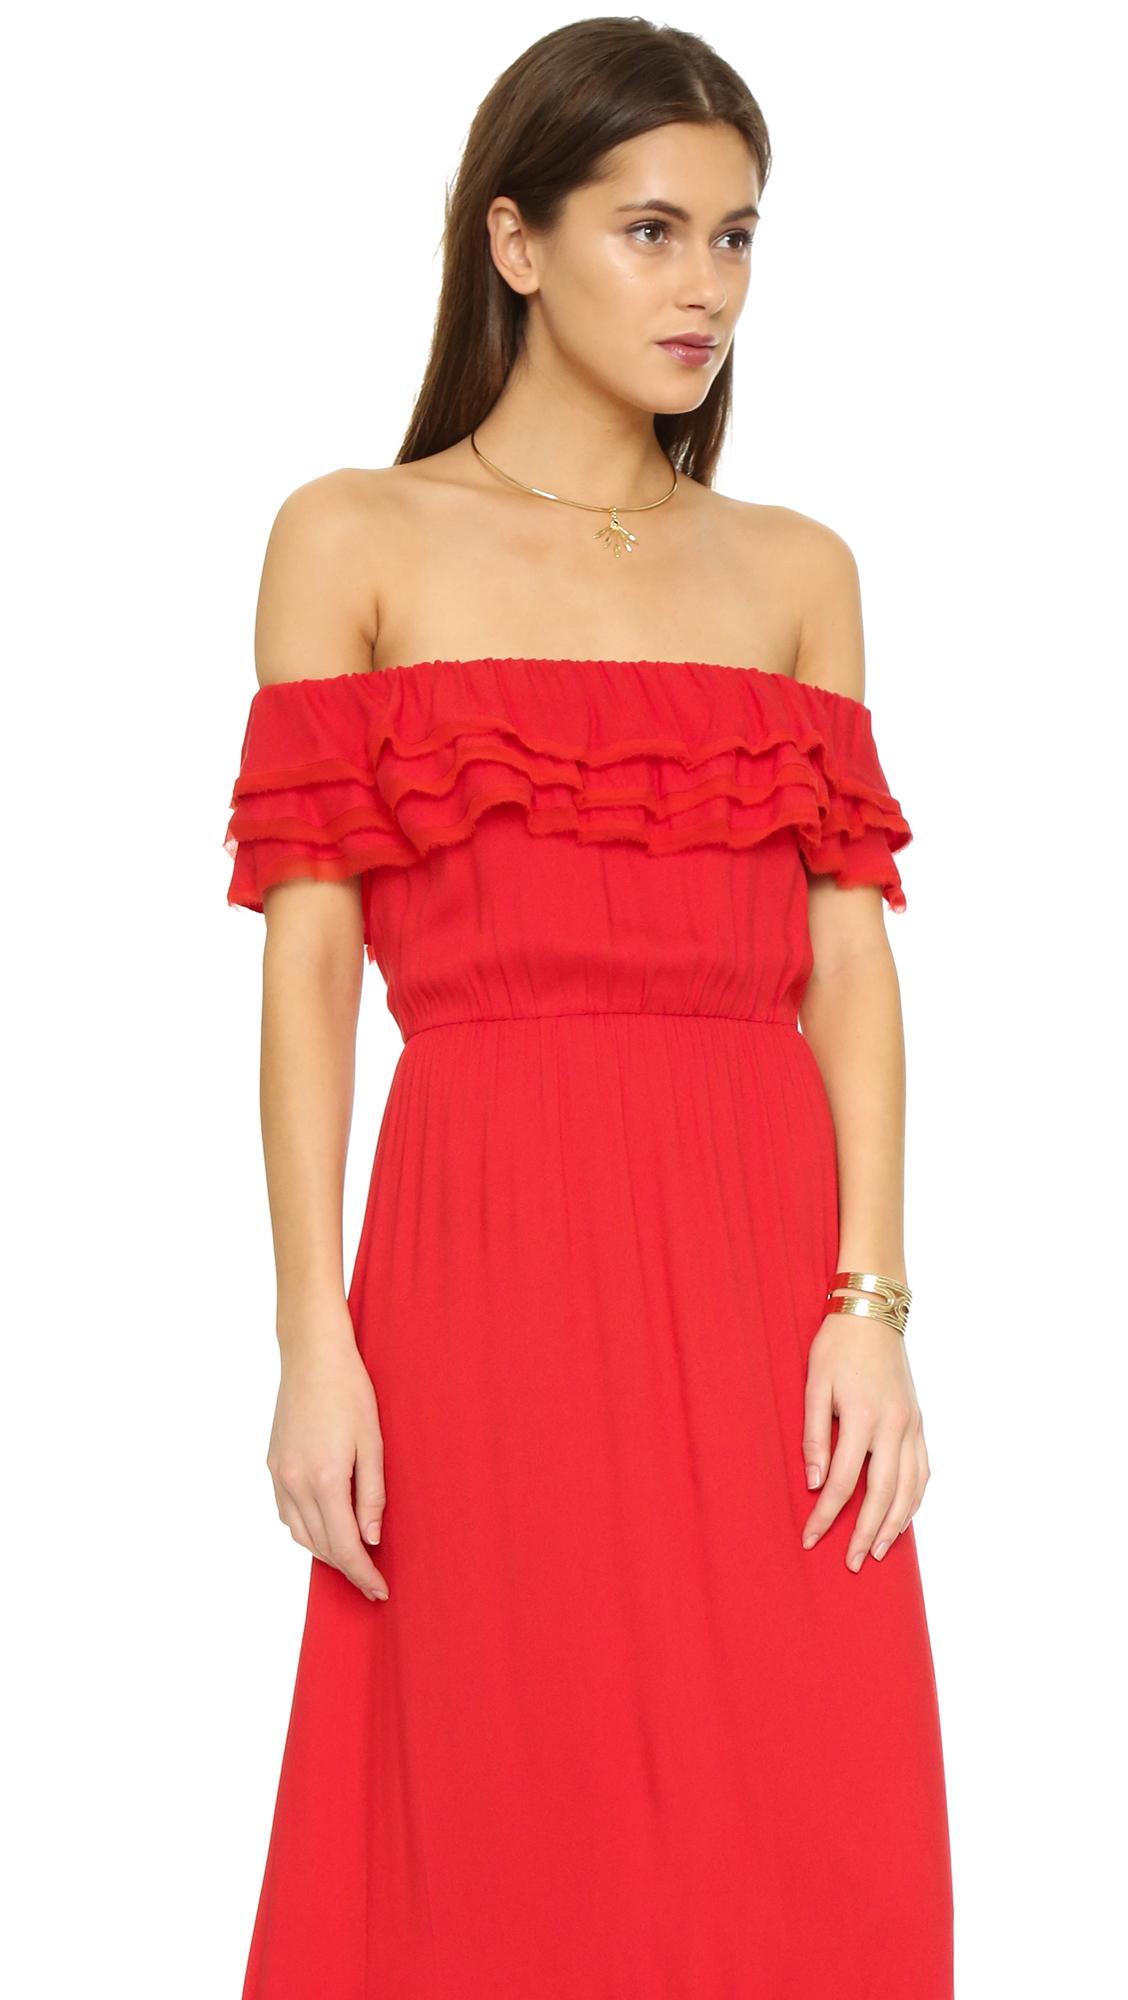 Lyst - Alice + Olivia Cheri Off Shoulder Maxi Dress in Red 0123a1e6a